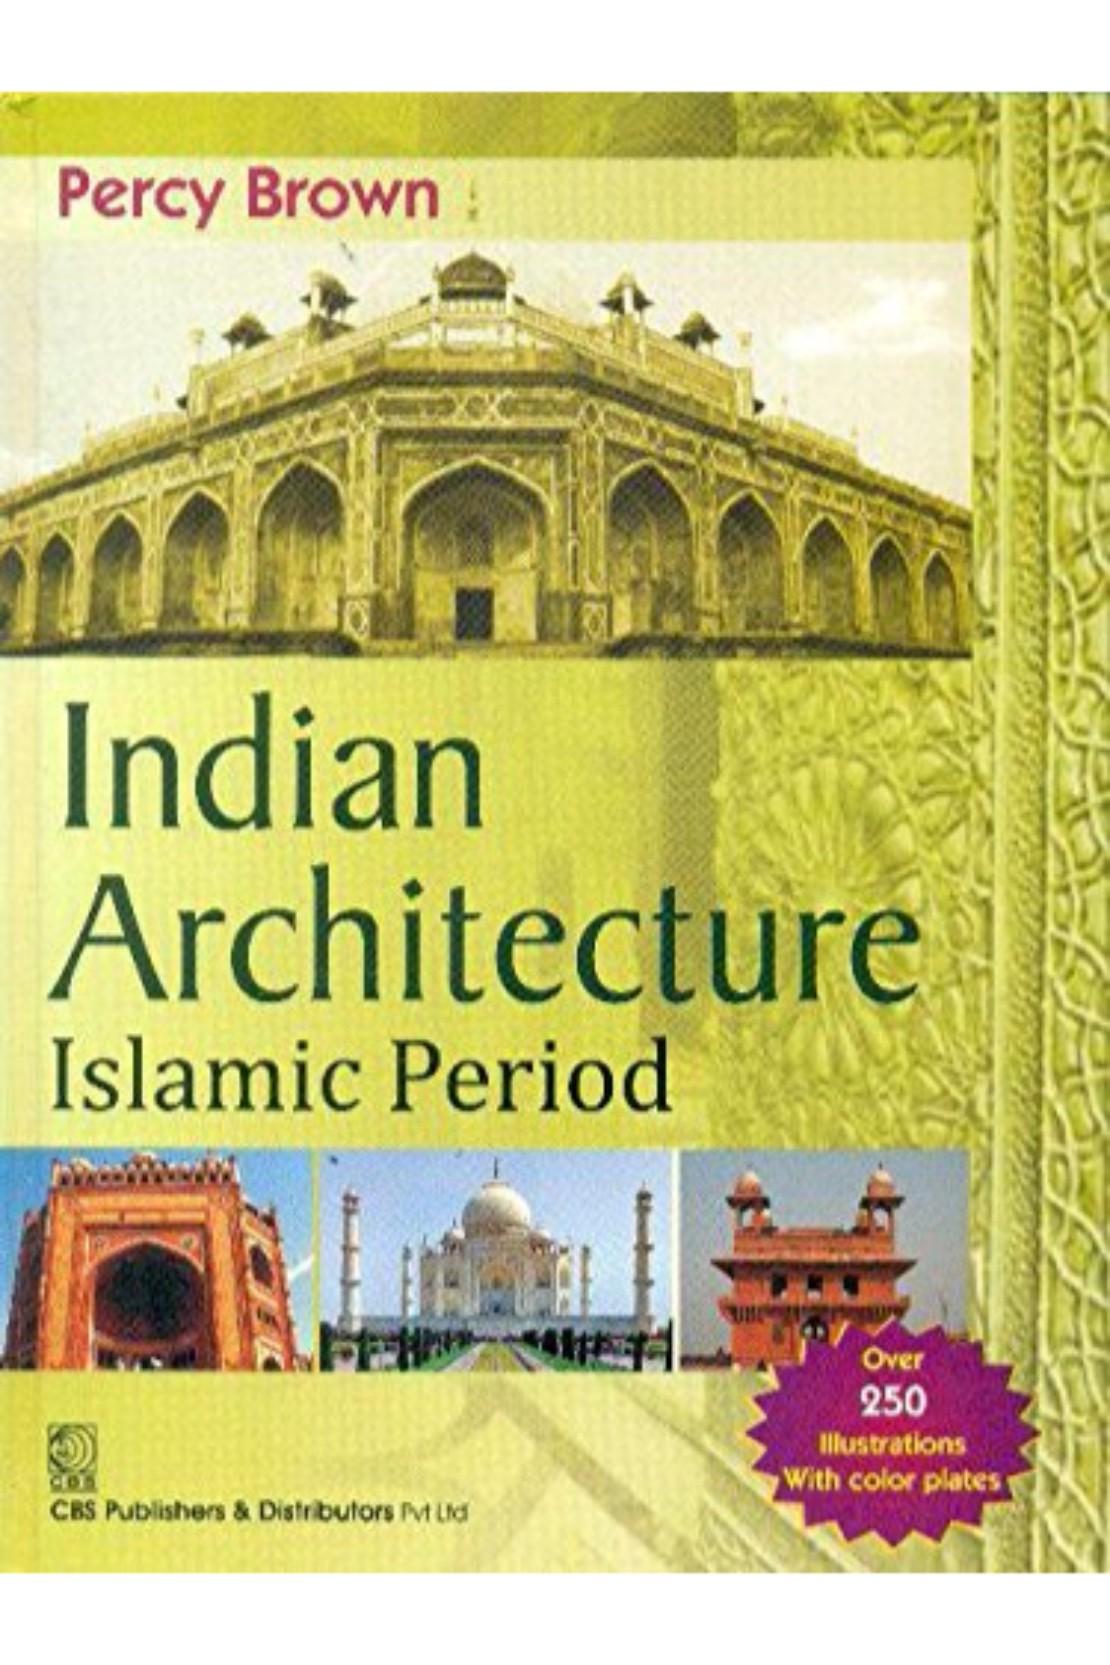 INDIAN ARCHITECTURE ISLAMIC PERIOD (PB)